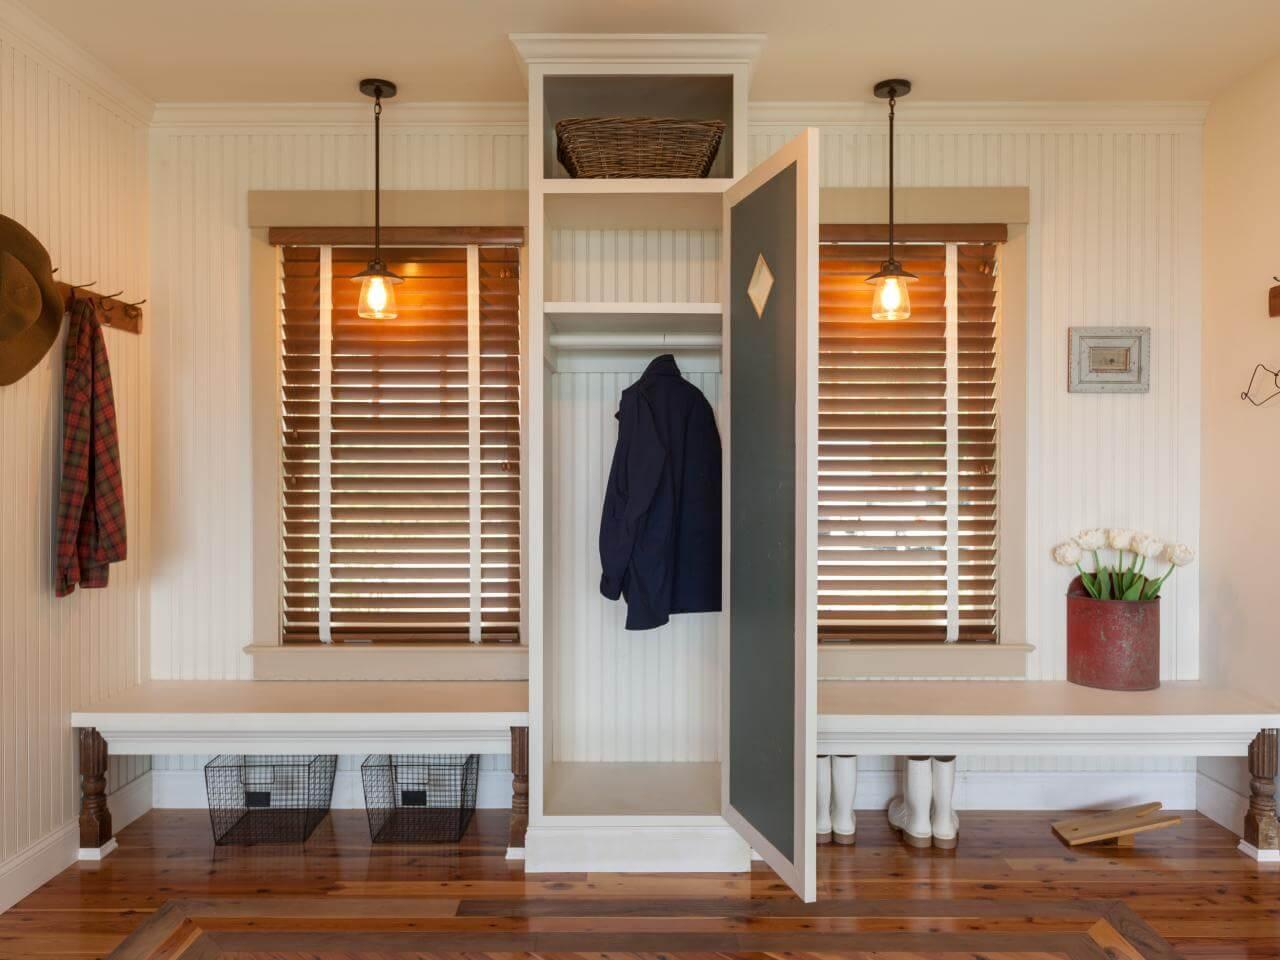 Prepac sonoma black entryway cubbie shelf and coat rack